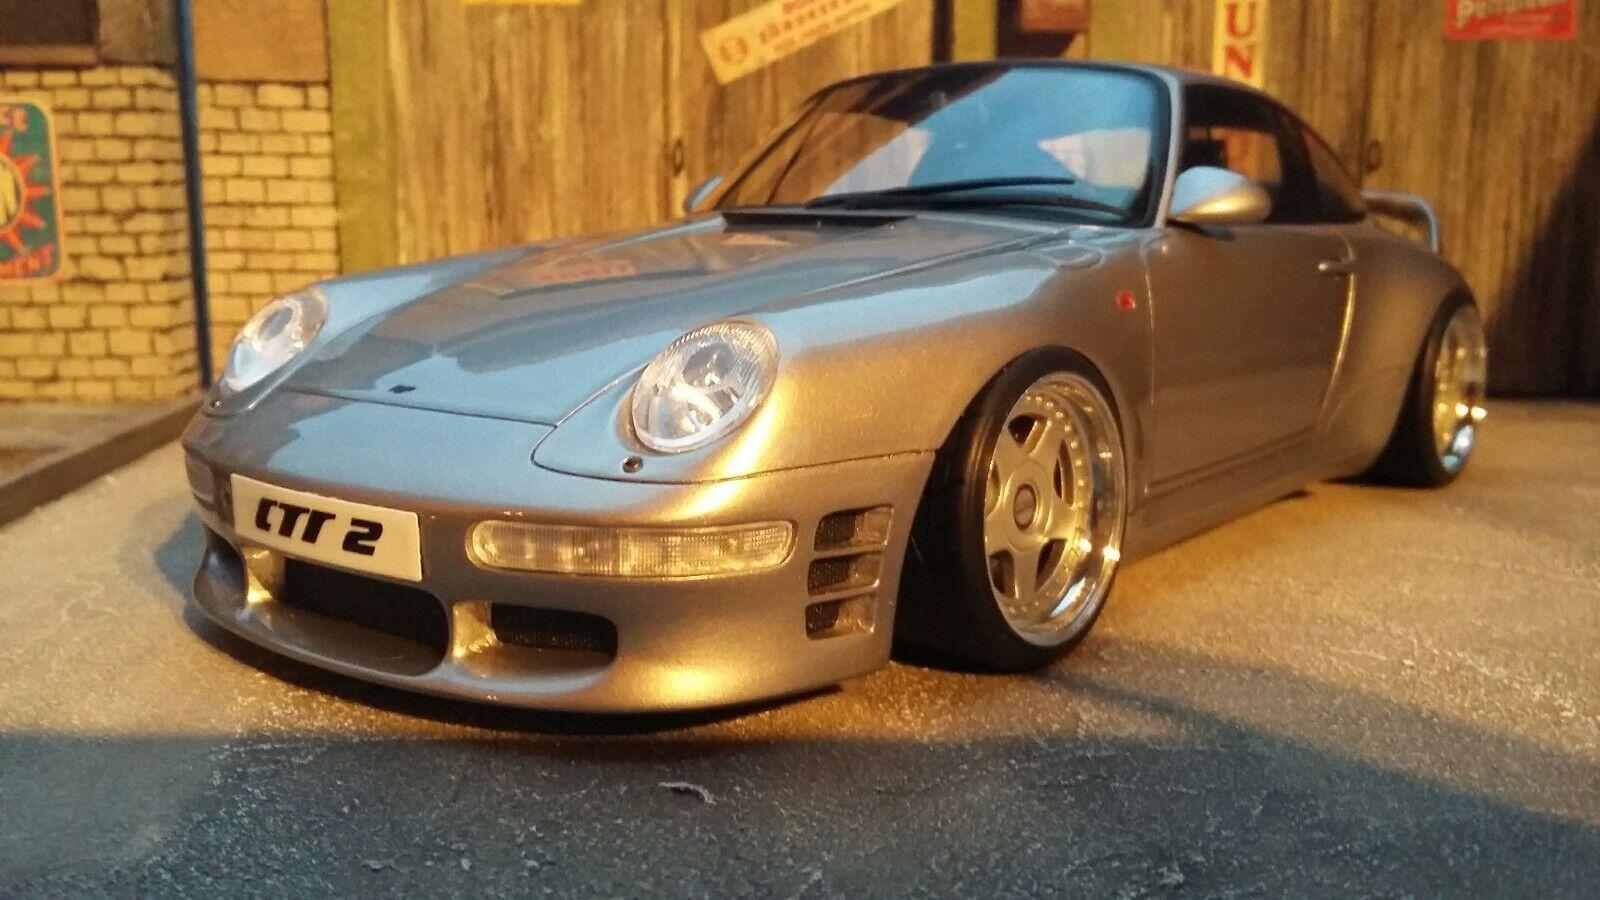 Porsche 911 993 Ruf CTR2 Umbau   Tuning   1 18 in OVP